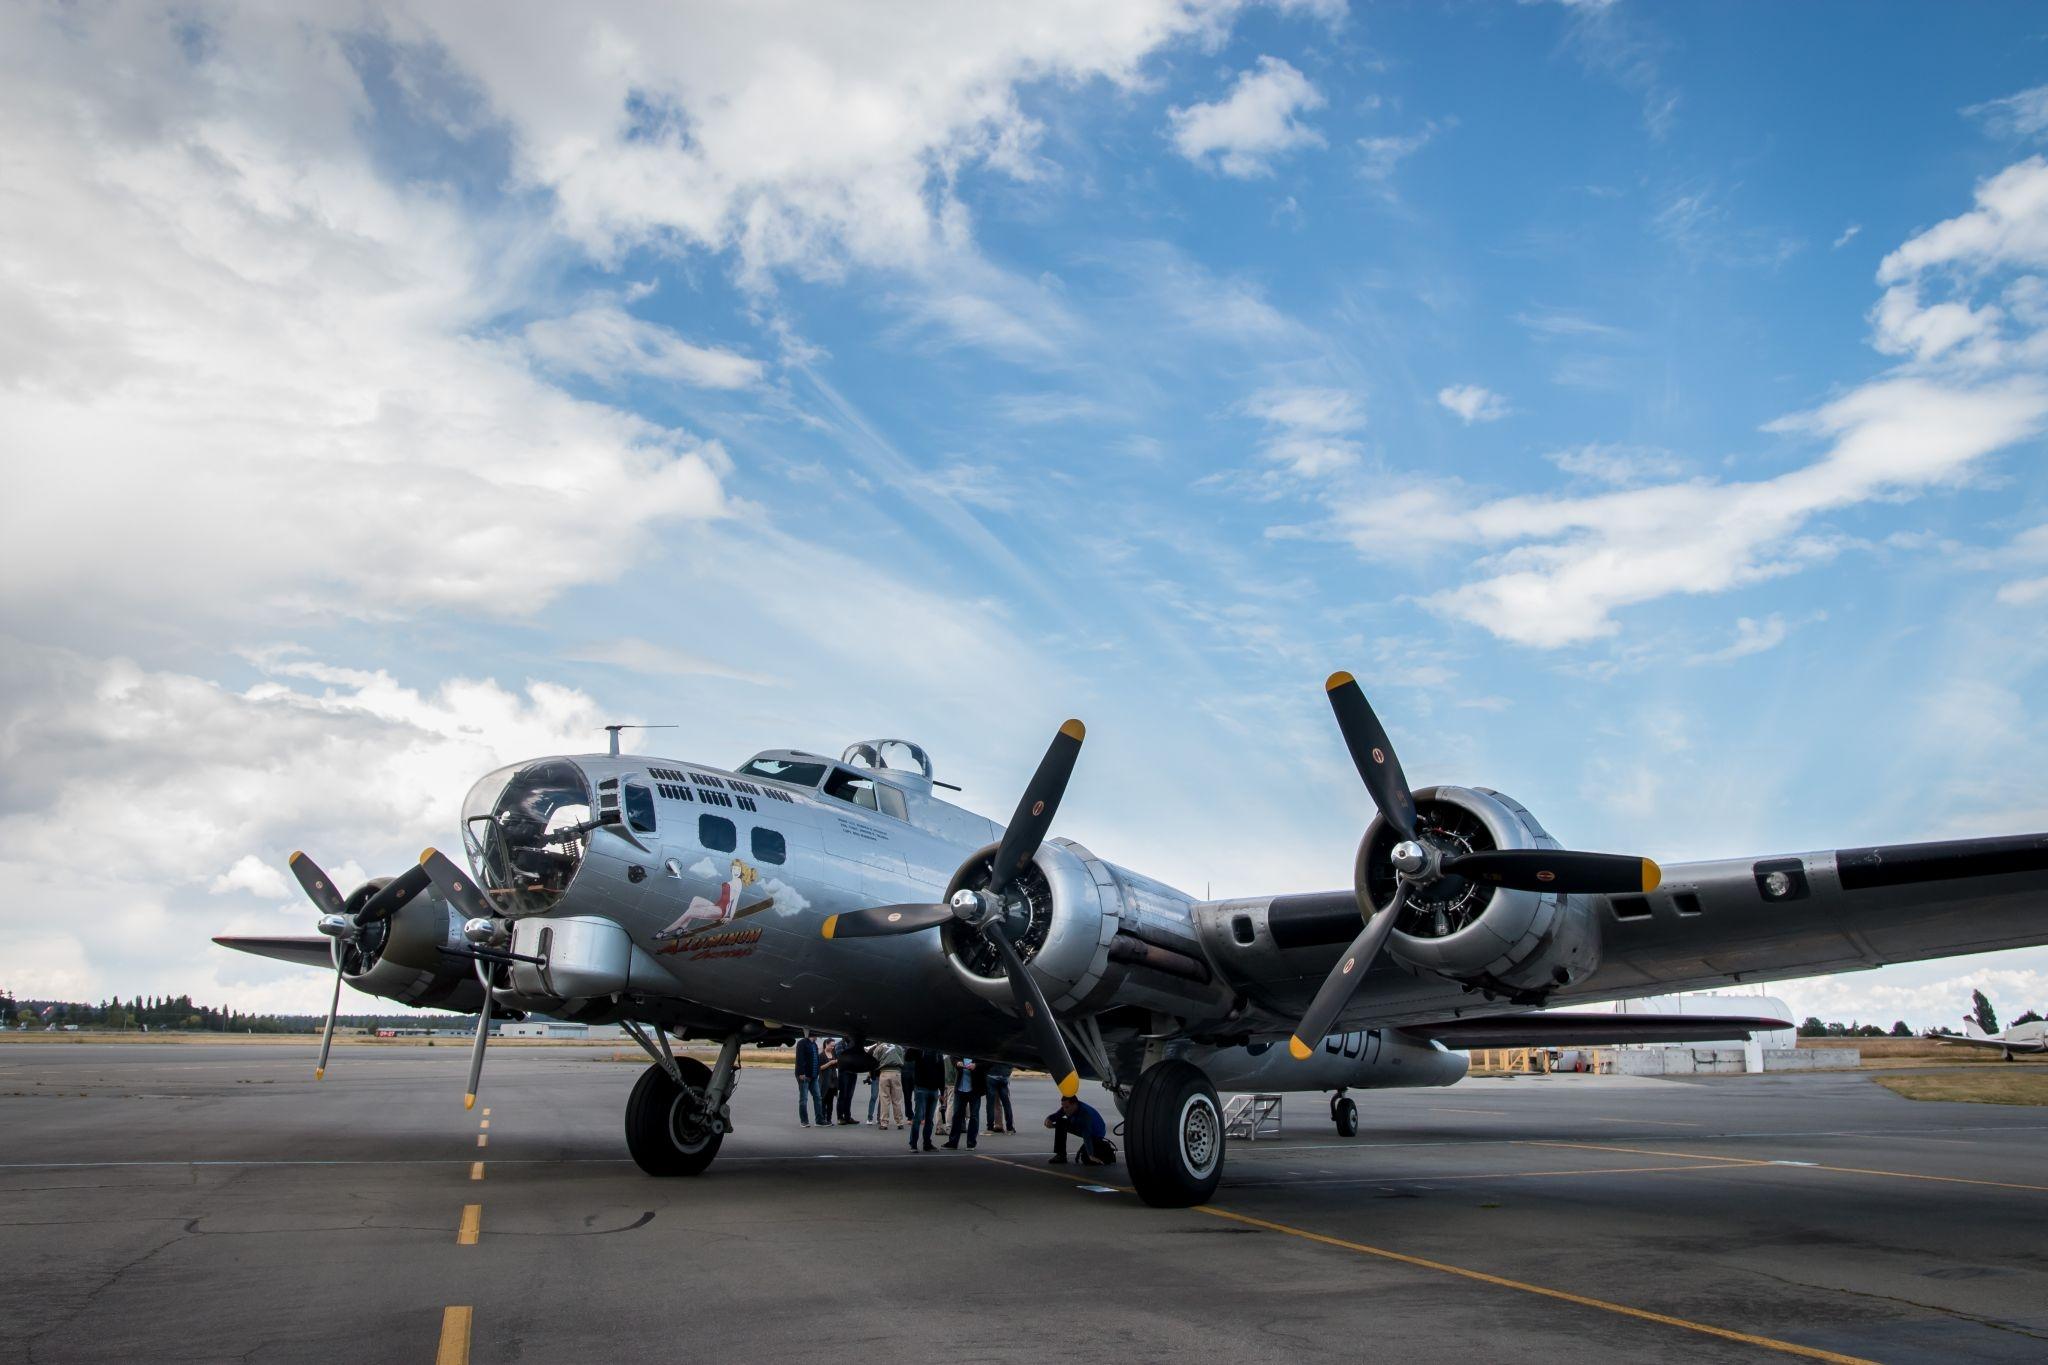 Jason and Jenny fly on a B-17 bomber!